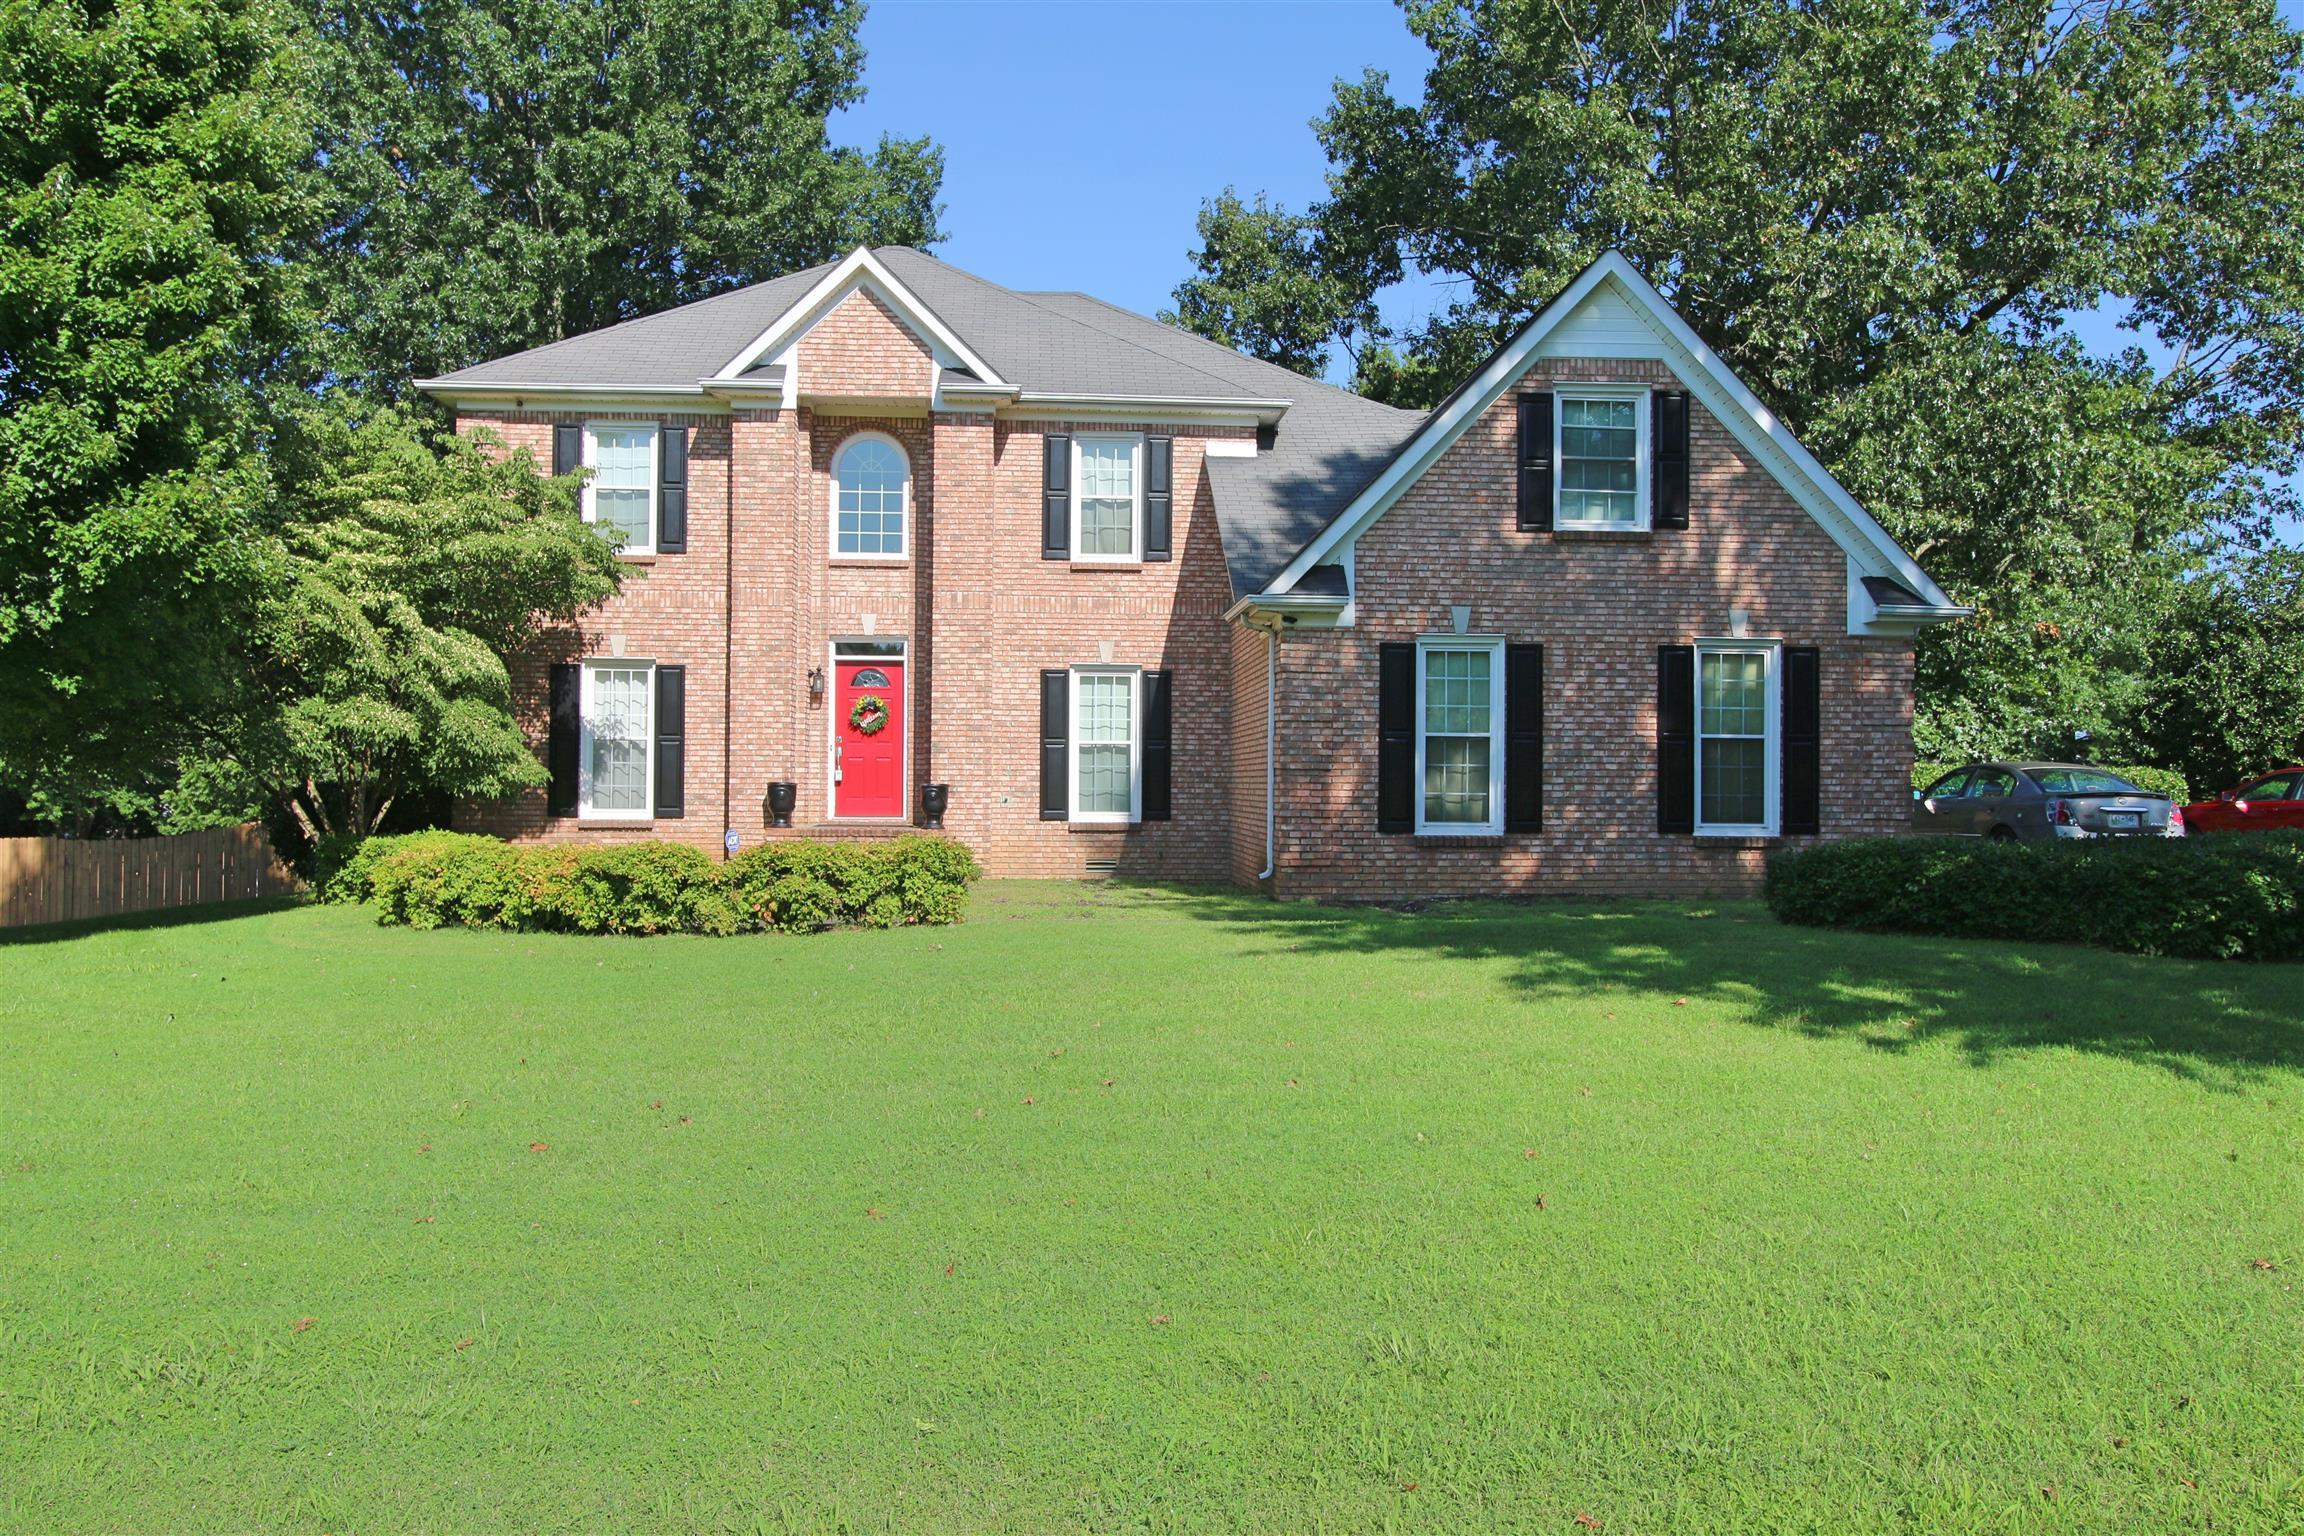 2223 Roanoke Rd, Clarksville, TN 37043 - Clarksville, TN real estate listing